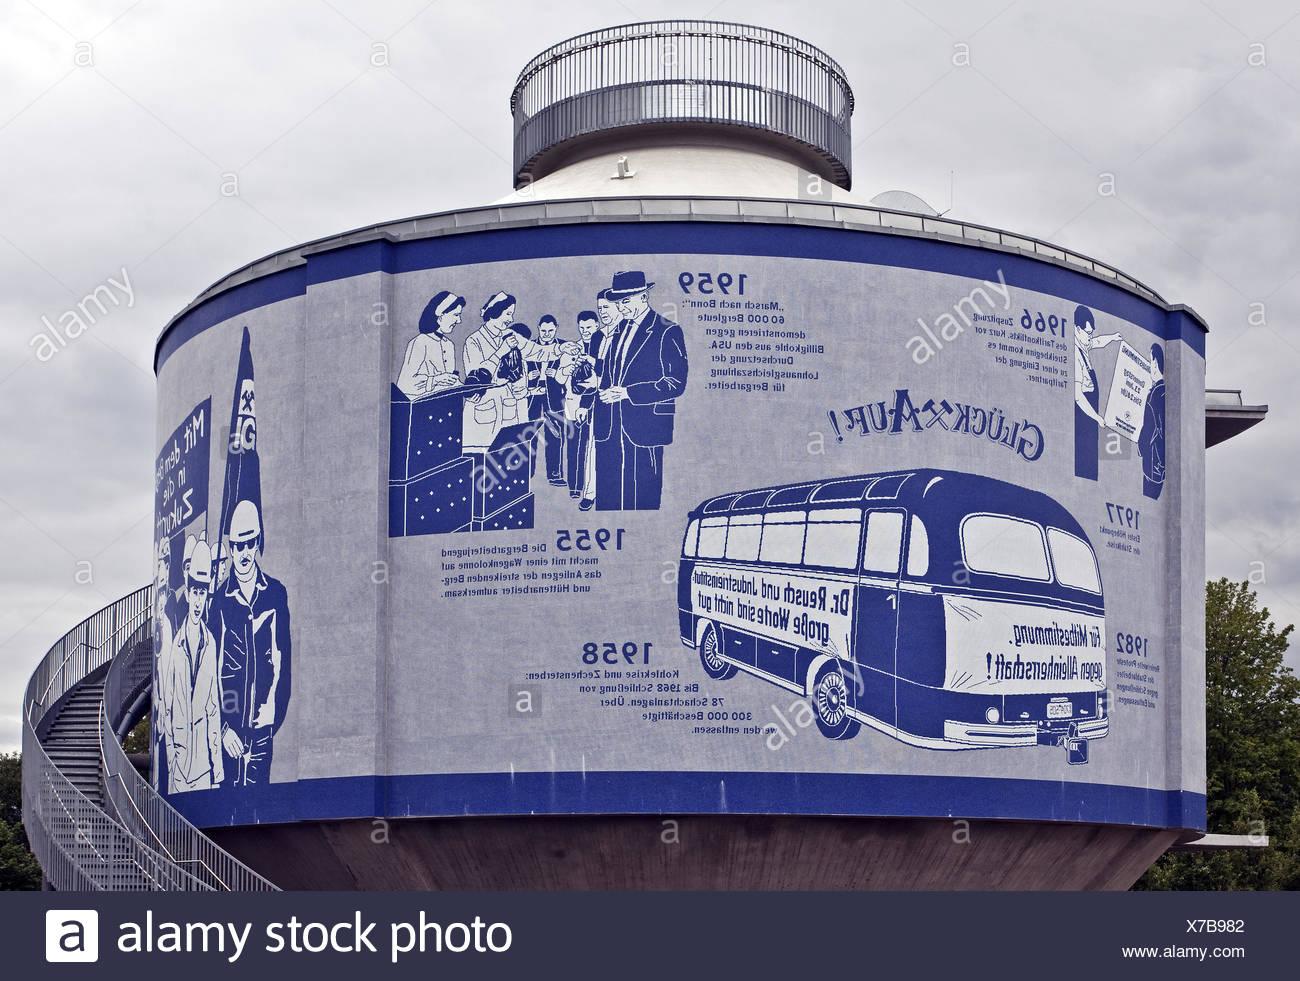 Wall mosaic Emscherkunst, Herne, Germany - Stock Image